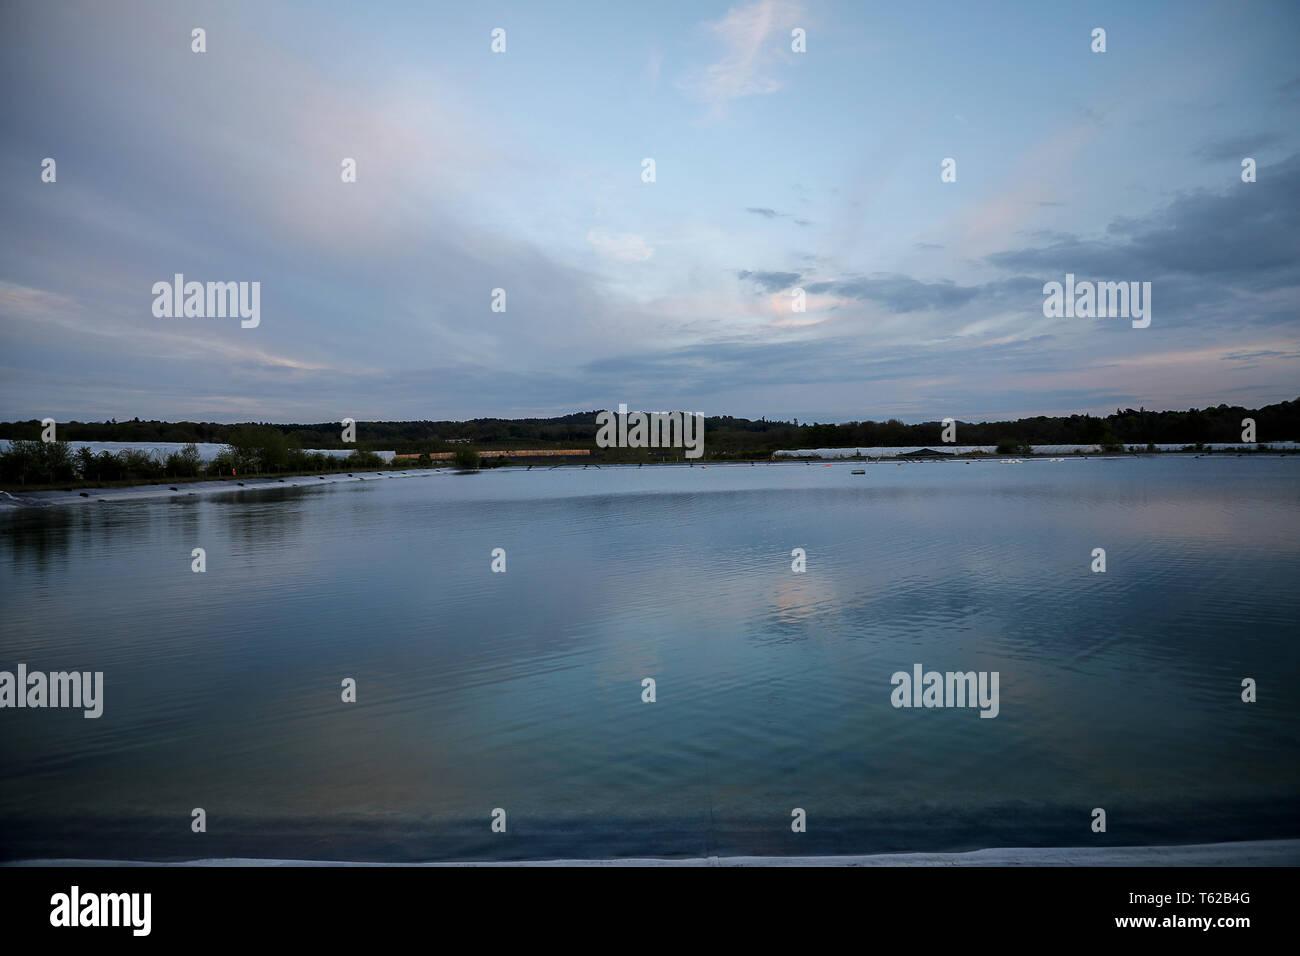 Sony Rx10 Iv Stock Photos & Sony Rx10 Iv Stock Images - Alamy